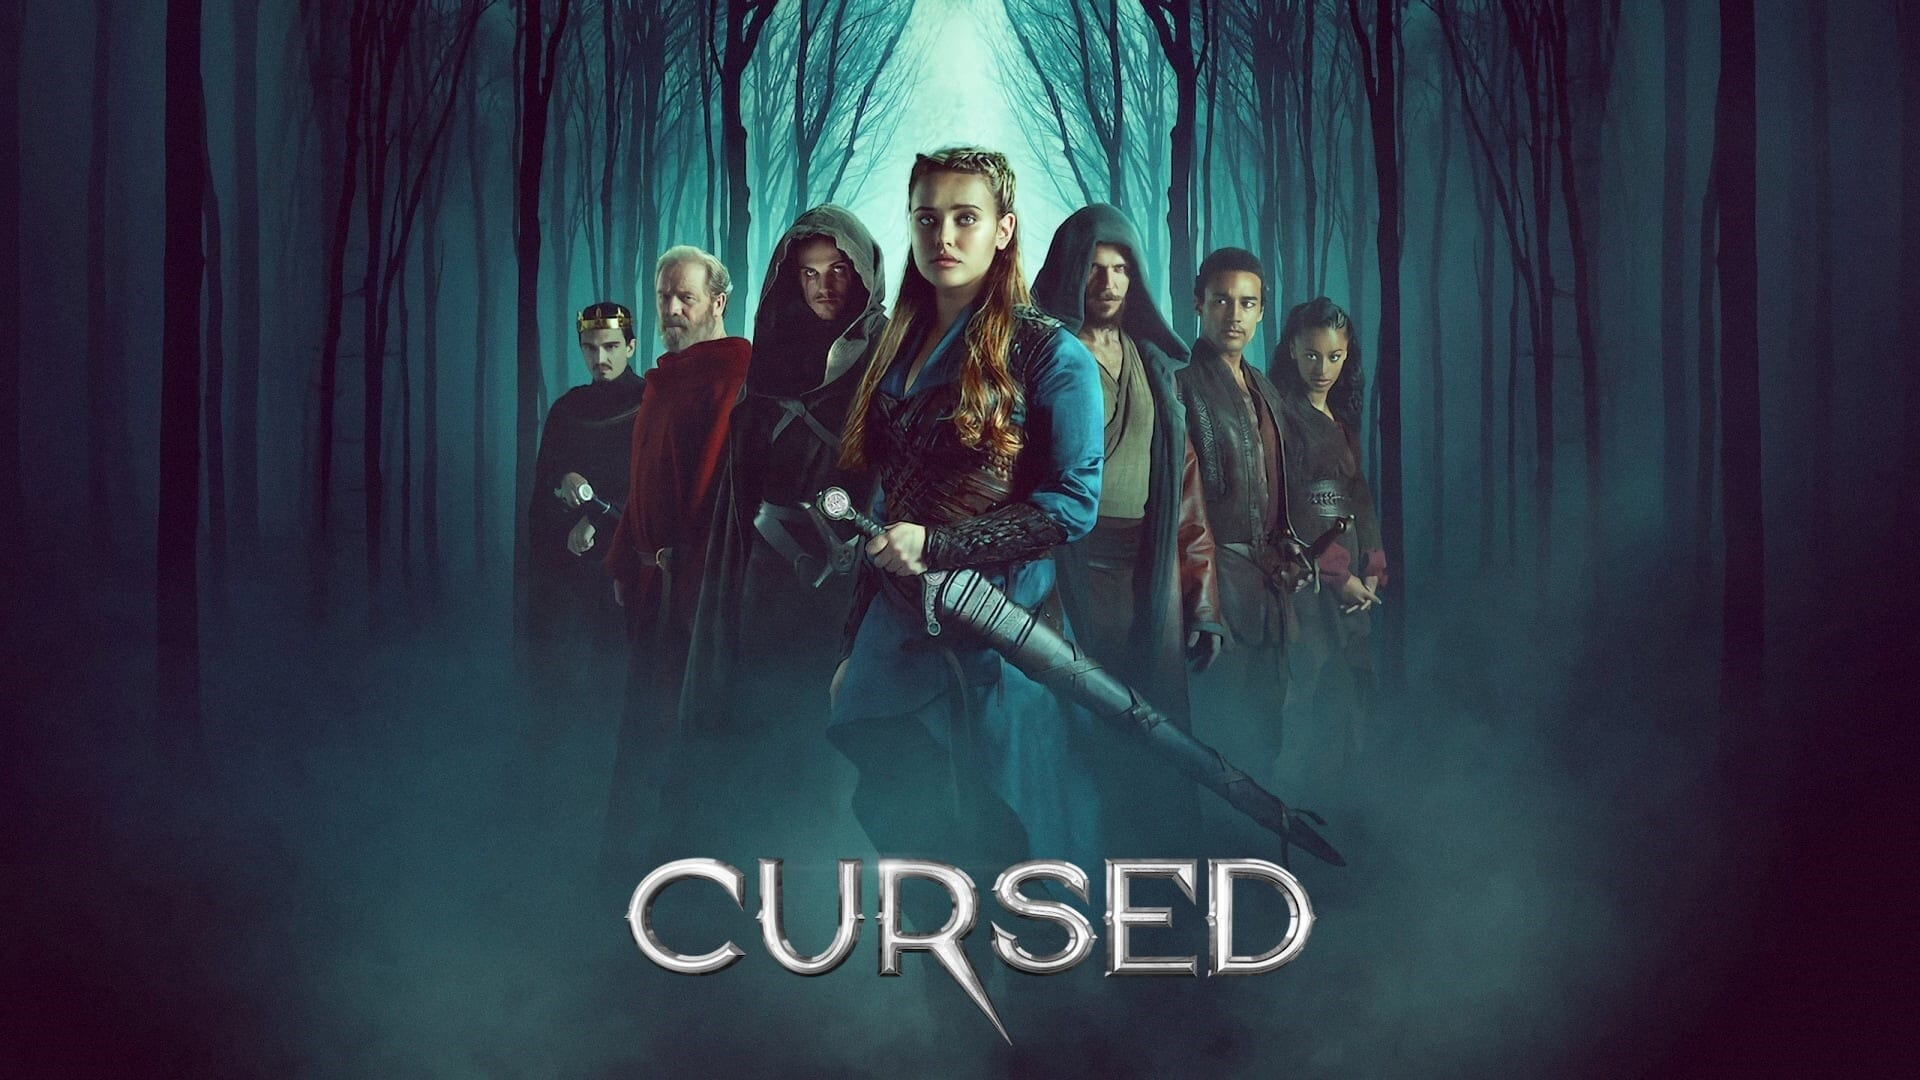 No second season for Cursed (2020)